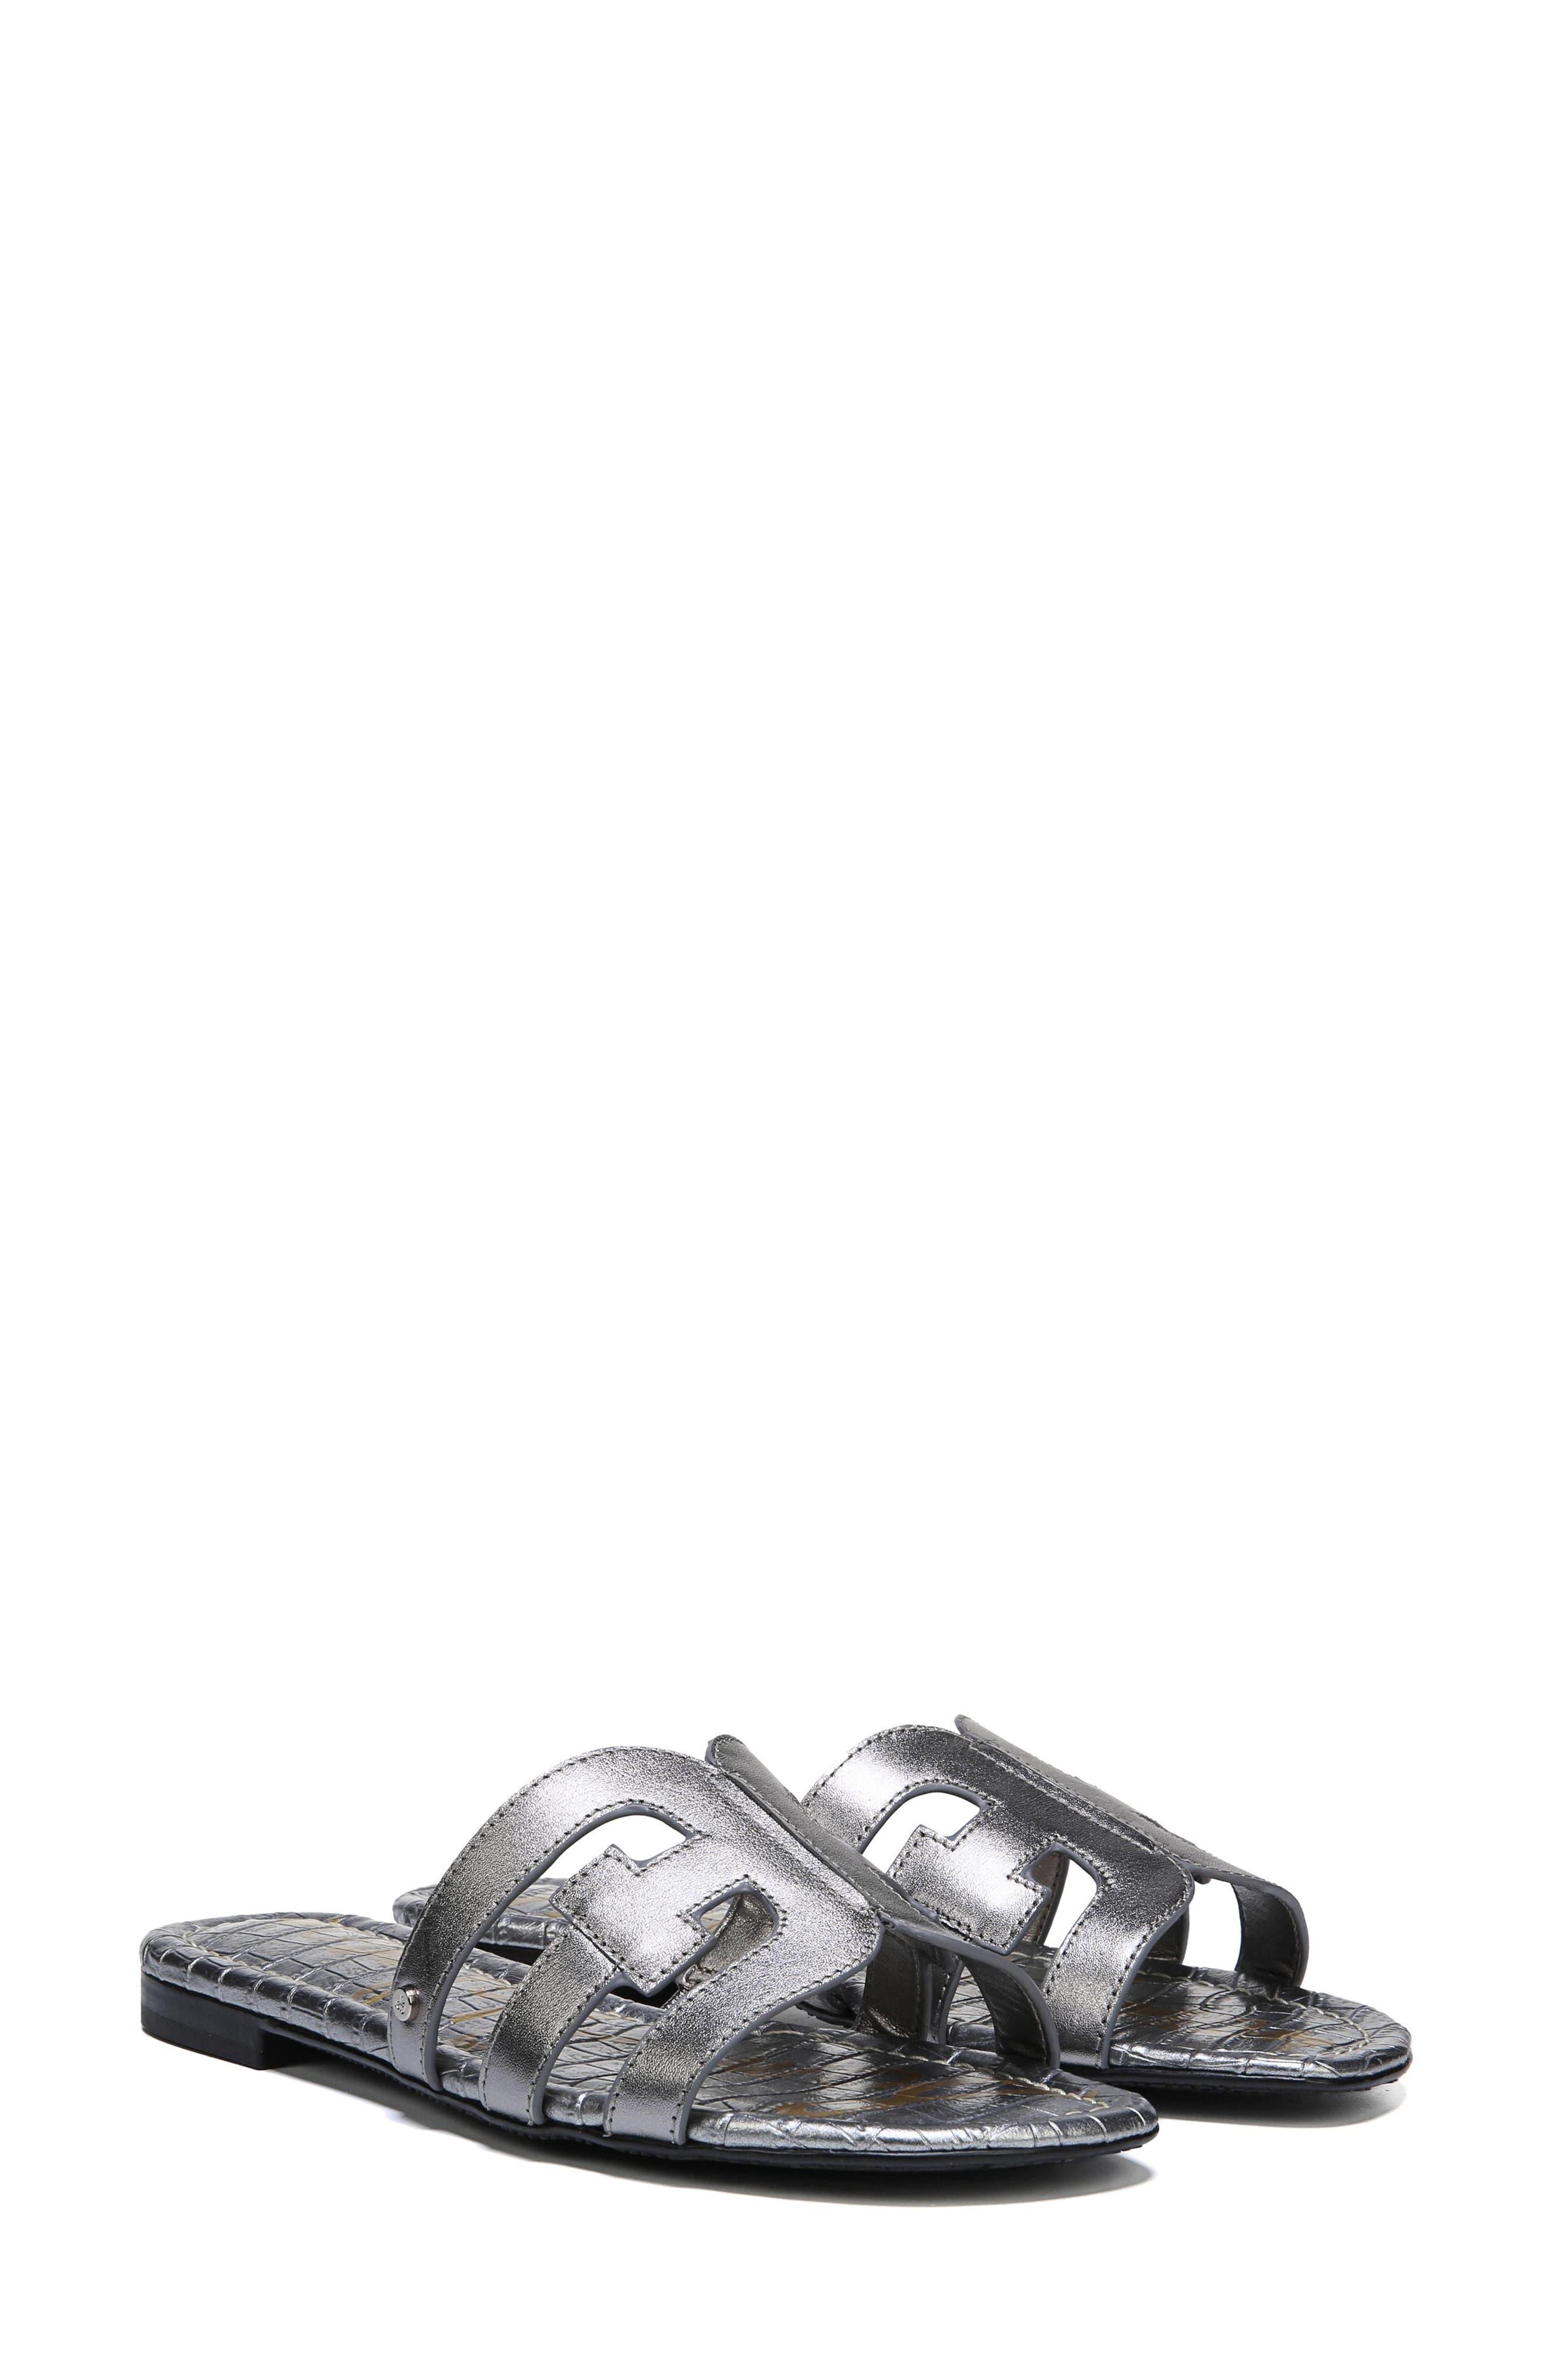 Bay Cutout Slide Sandal,                             Alternate thumbnail 8, color,                             PEWTER LEATHER